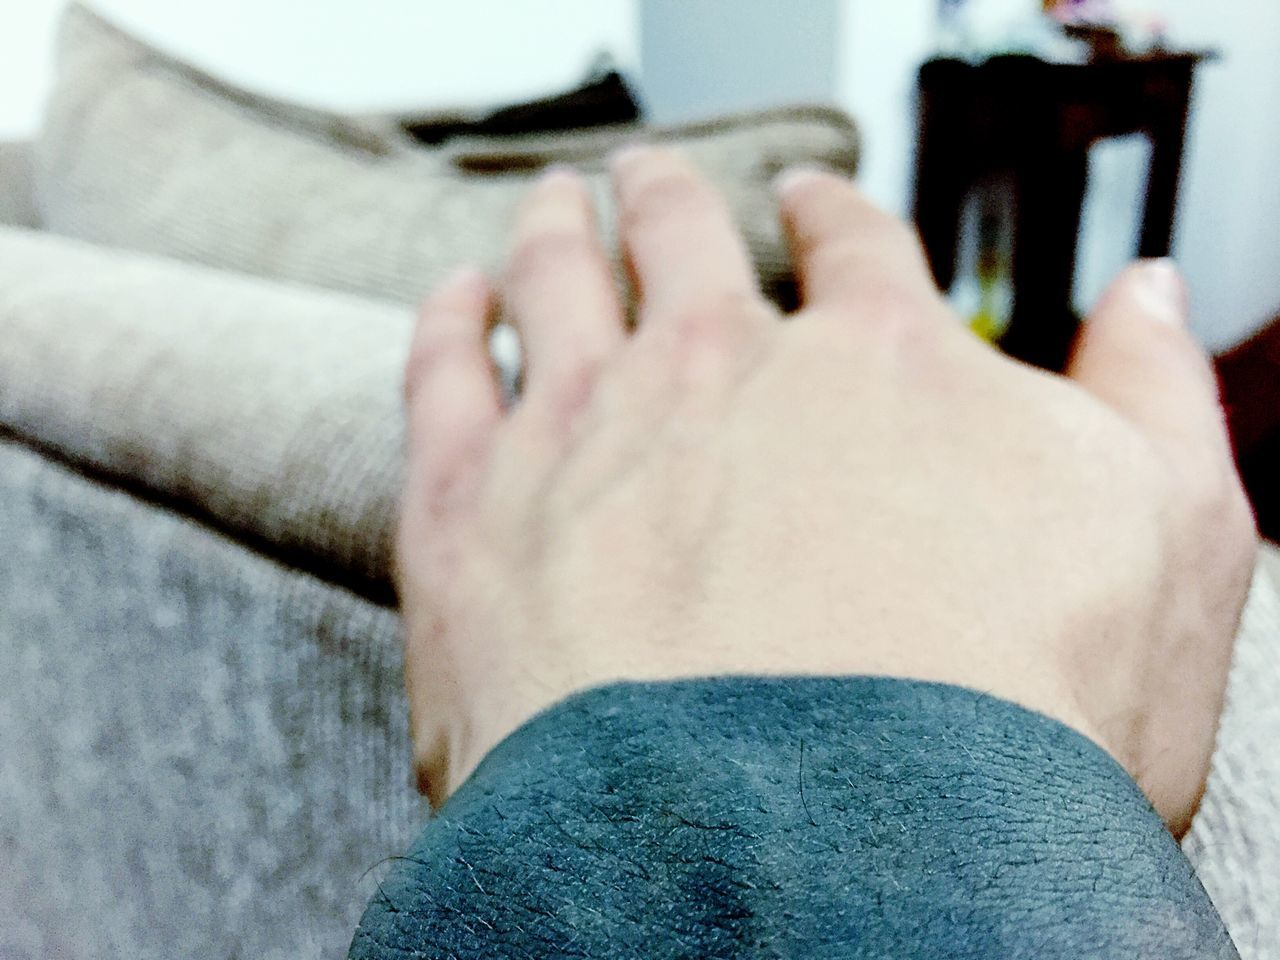 Blackandwhite Tattoo Blackout EyeEm Gallery Chile♥ Hands Hands Only Me :)  Artiseverywhere EyeEm Best Shots